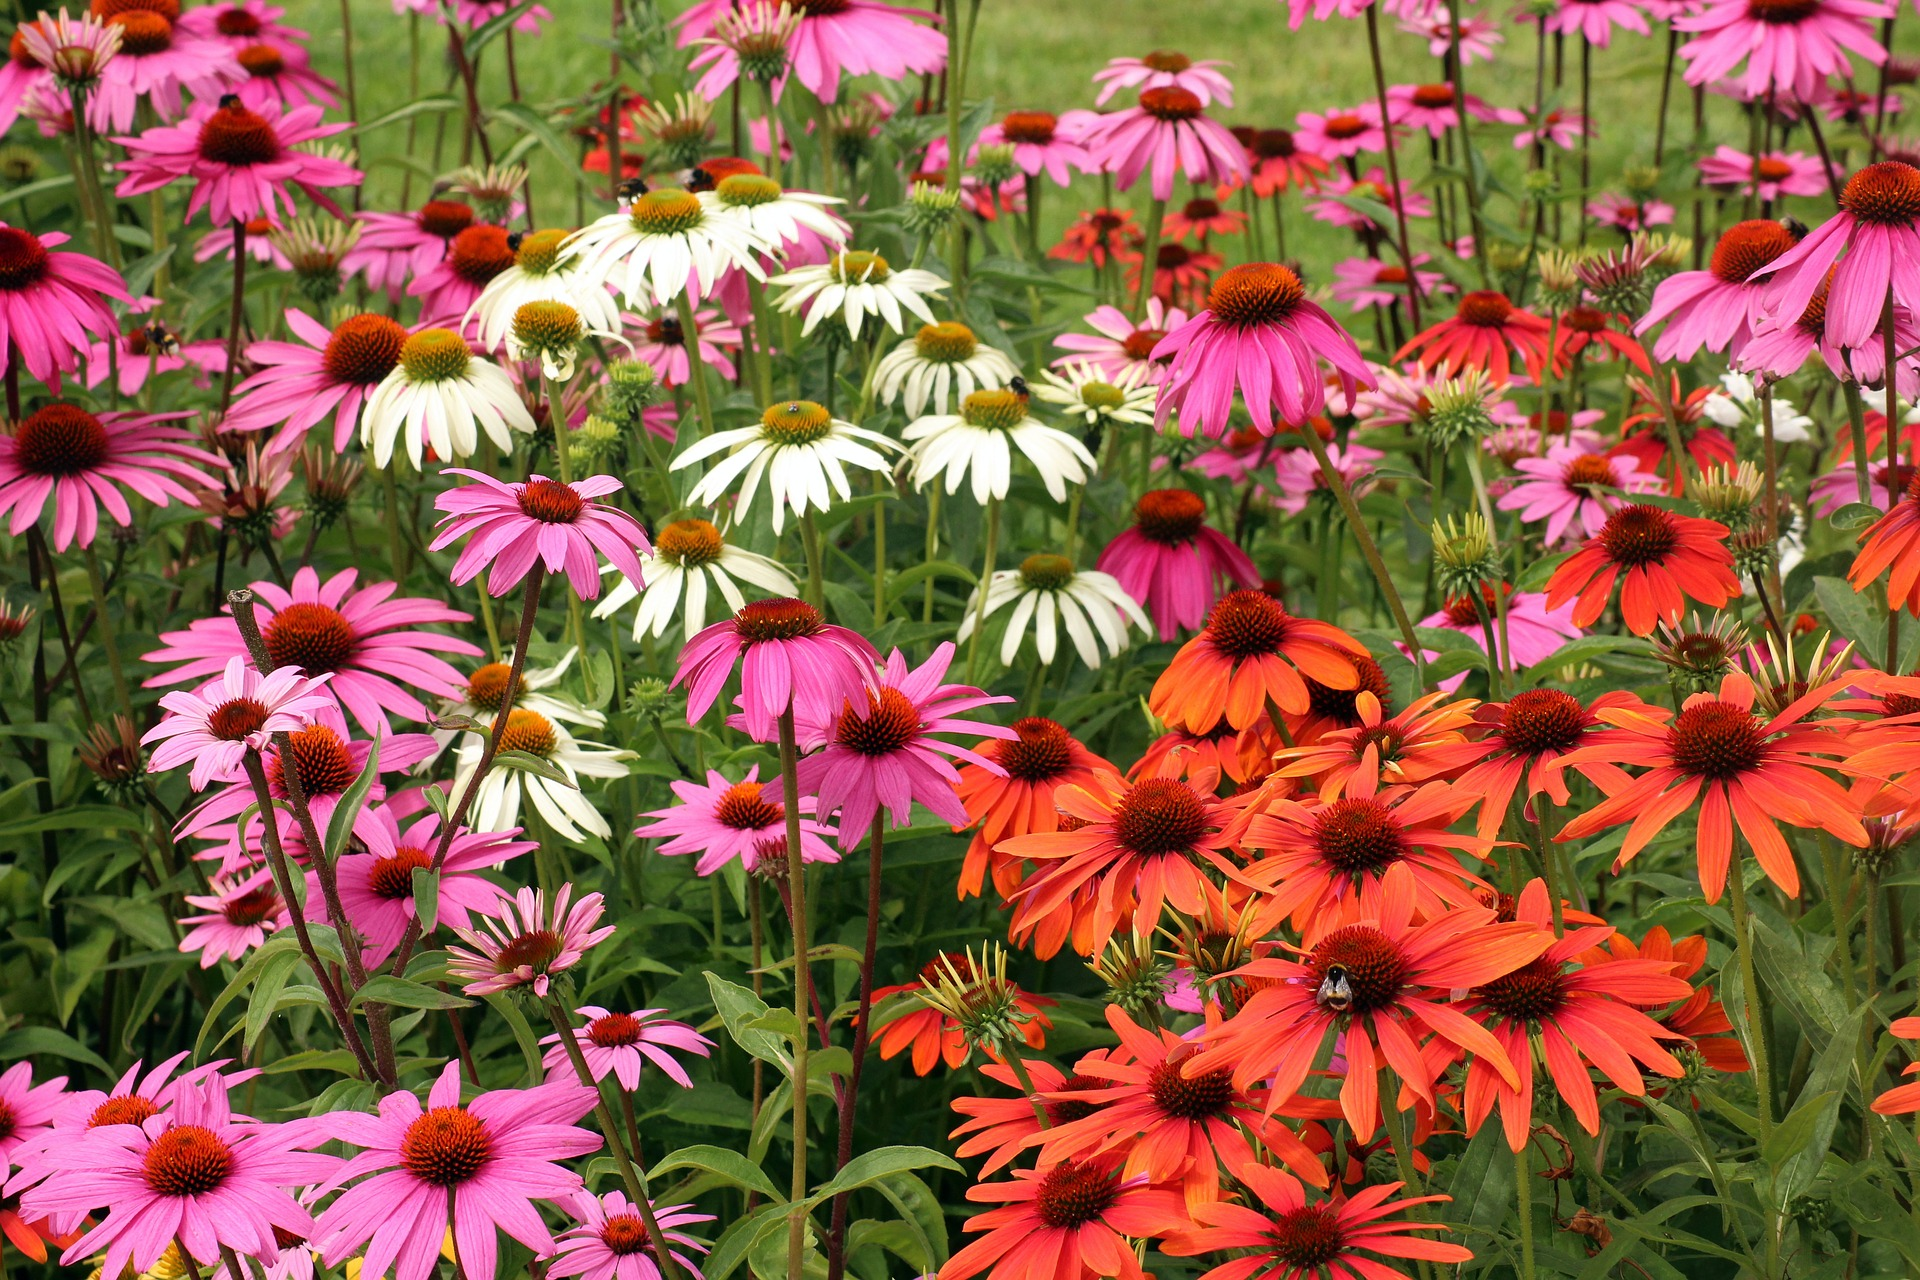 23 Favorite Butterfly Garden Plants for Attracting Helpful Pollinators